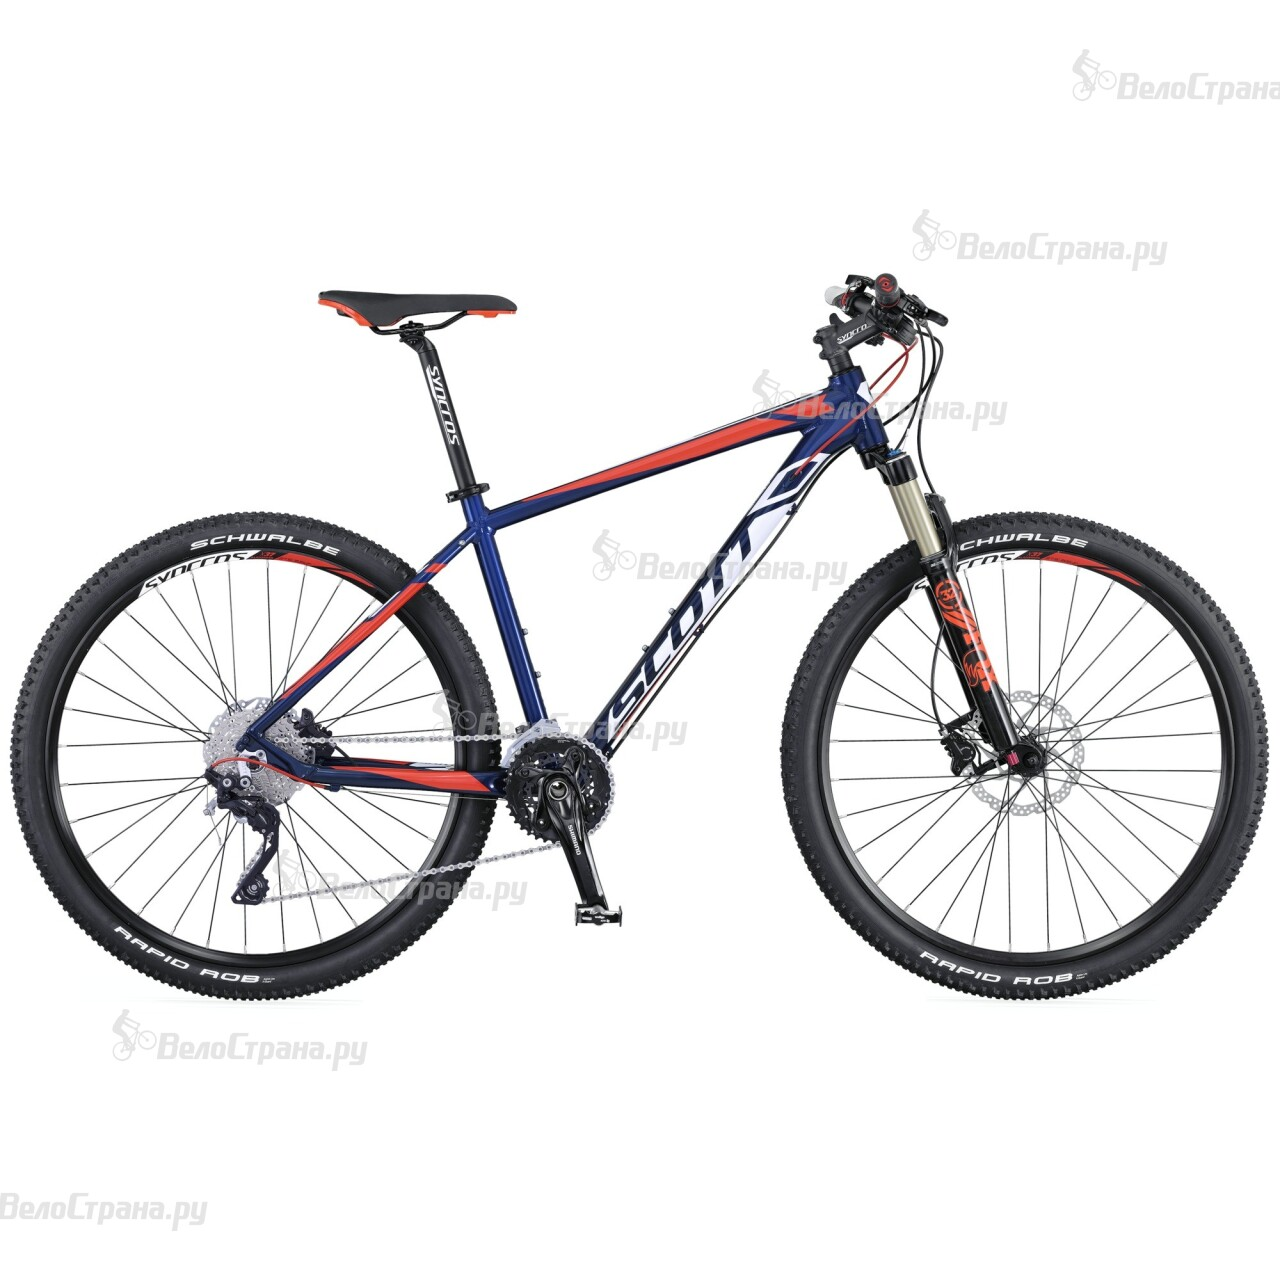 Велосипед Scott Aspect 700 (2016) велосипед scott aspect 700 27 5 2016